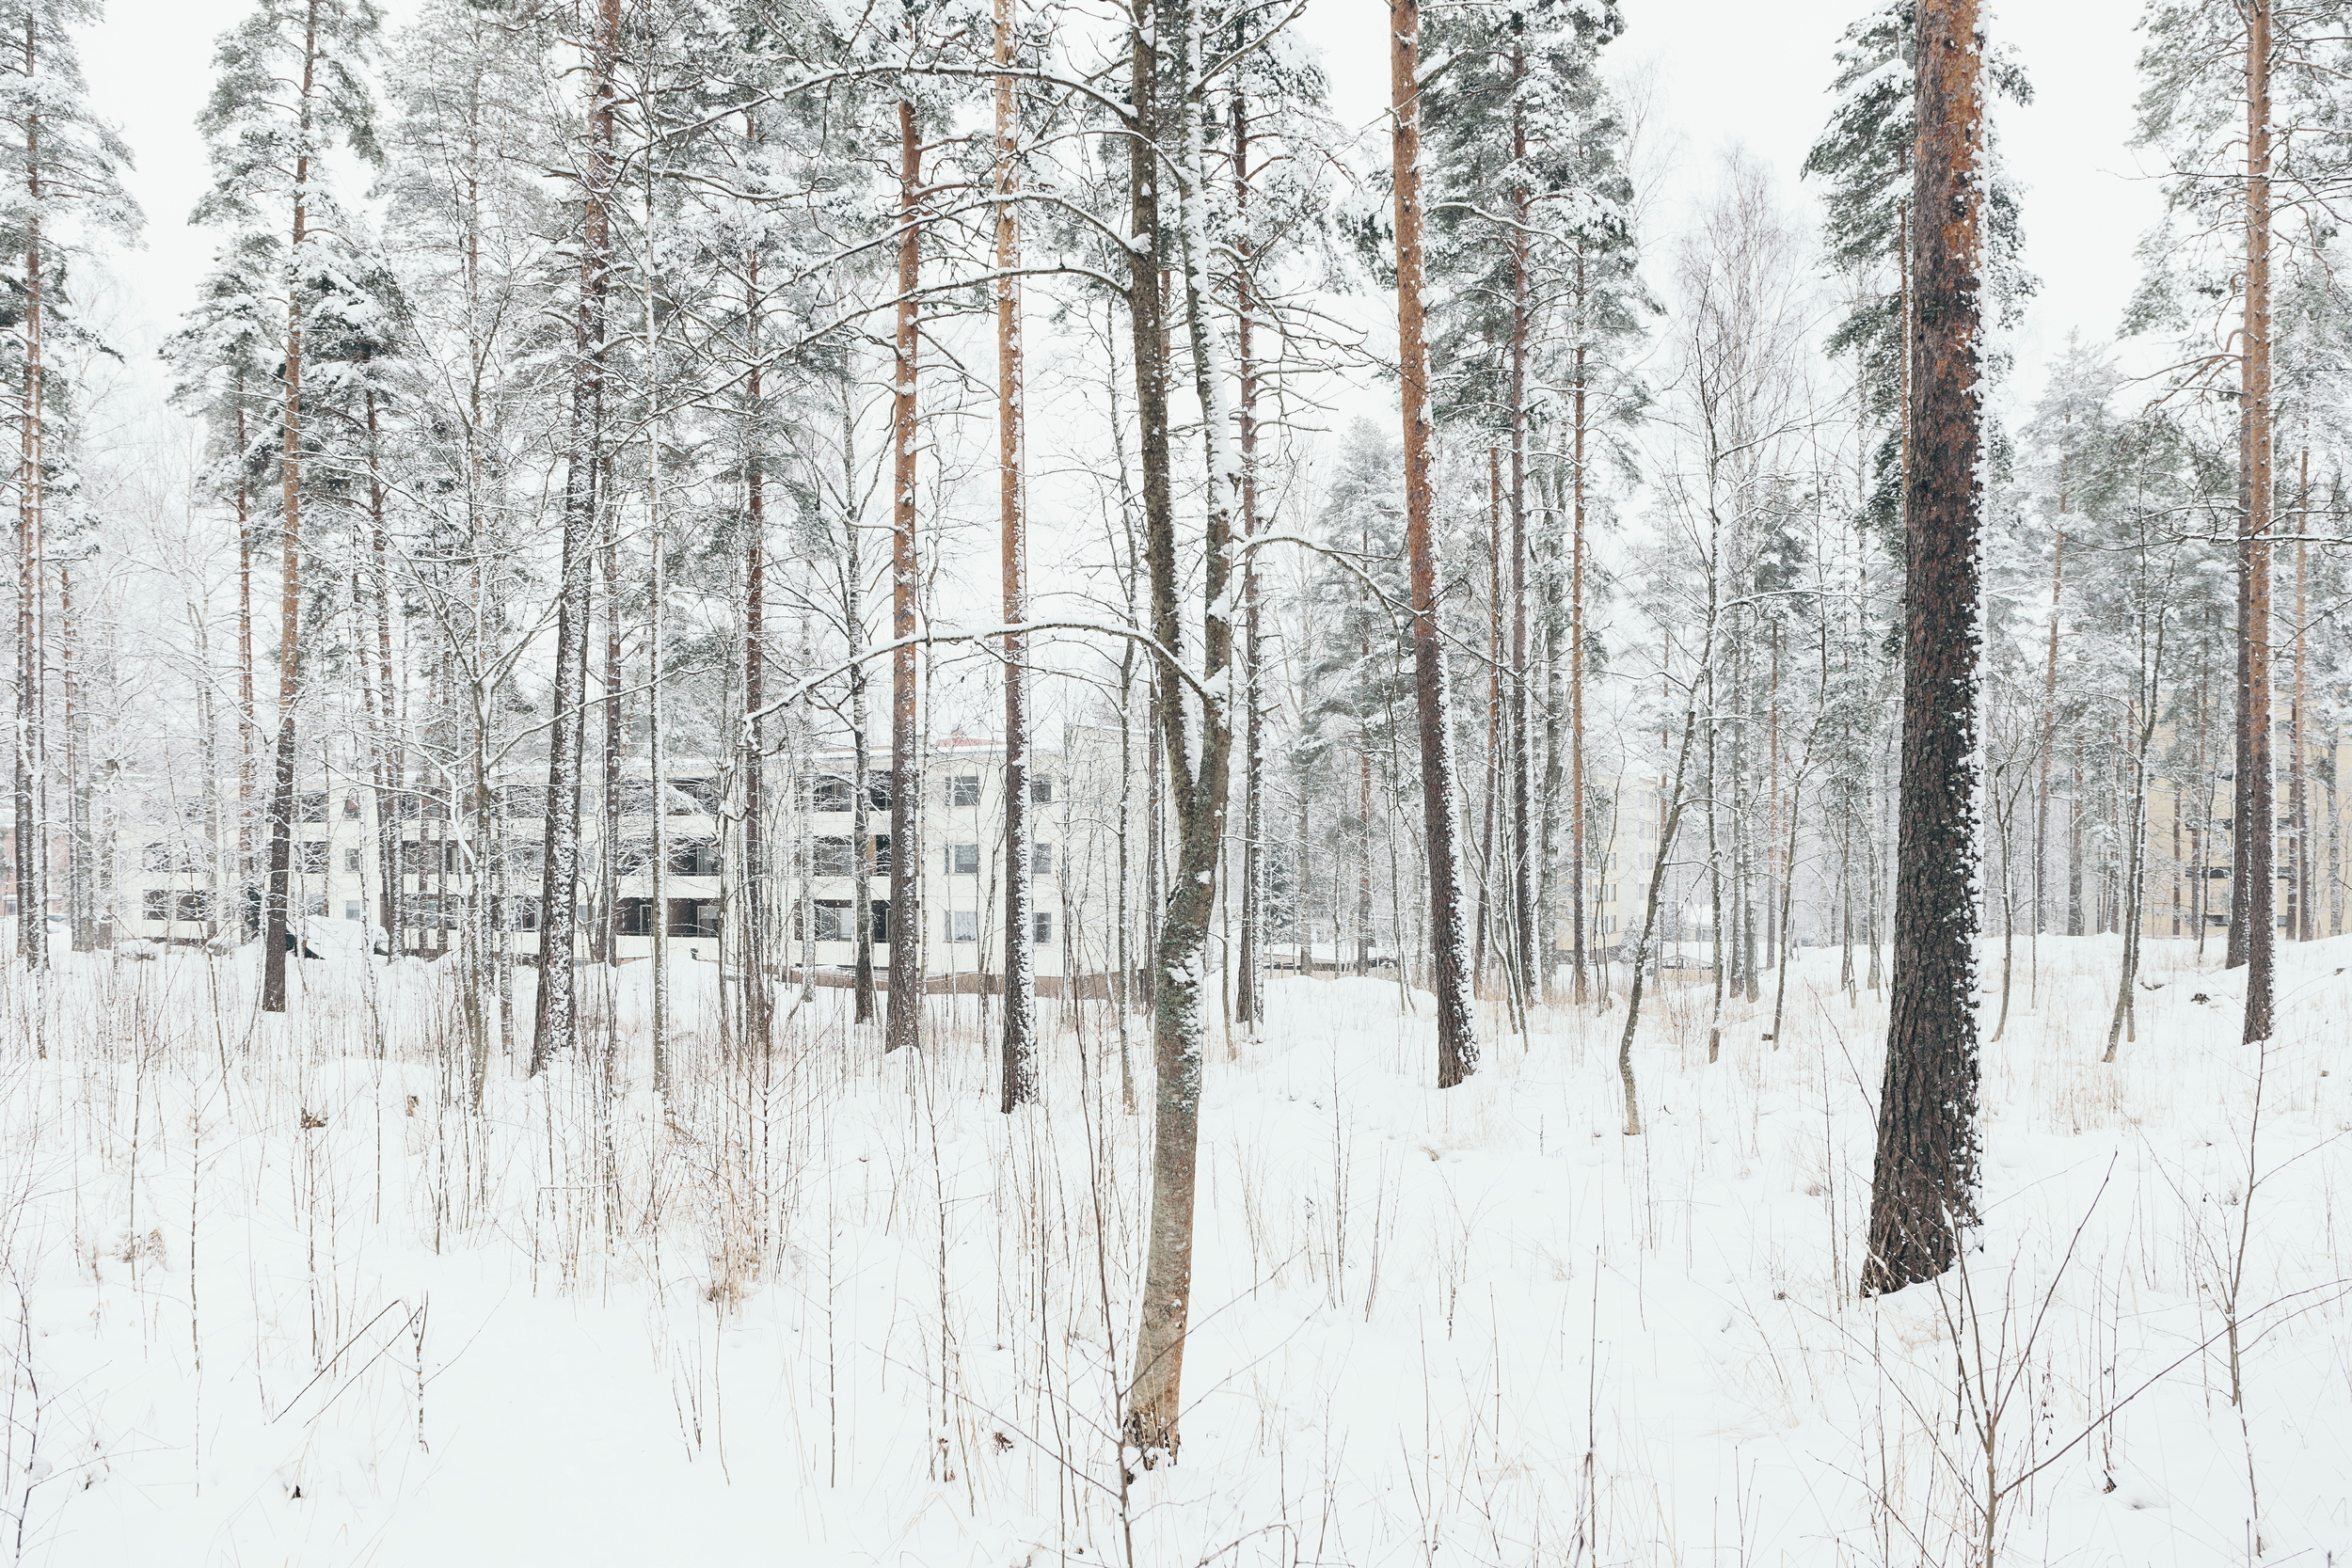 Heinola, Finland, February 2016